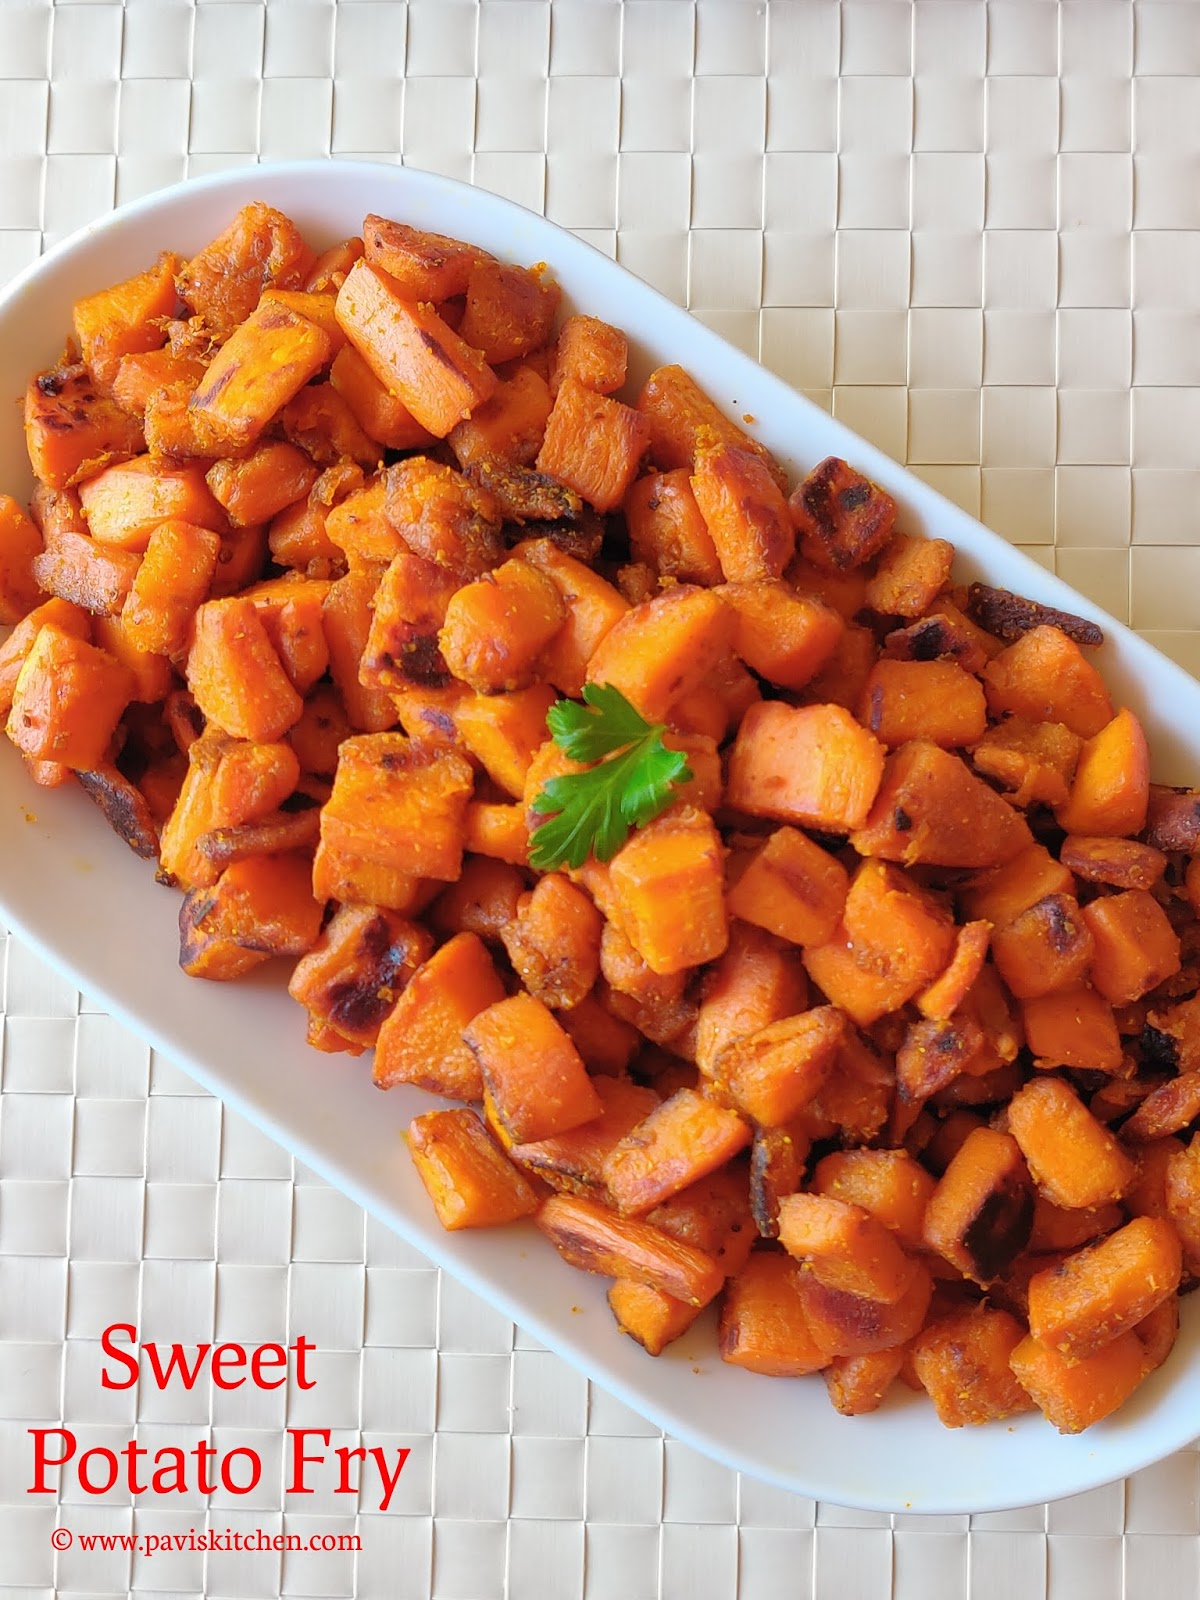 Sweet Potato Fry | Sakkaravalli Kizhangu Varuval | Potato Fry Recipe